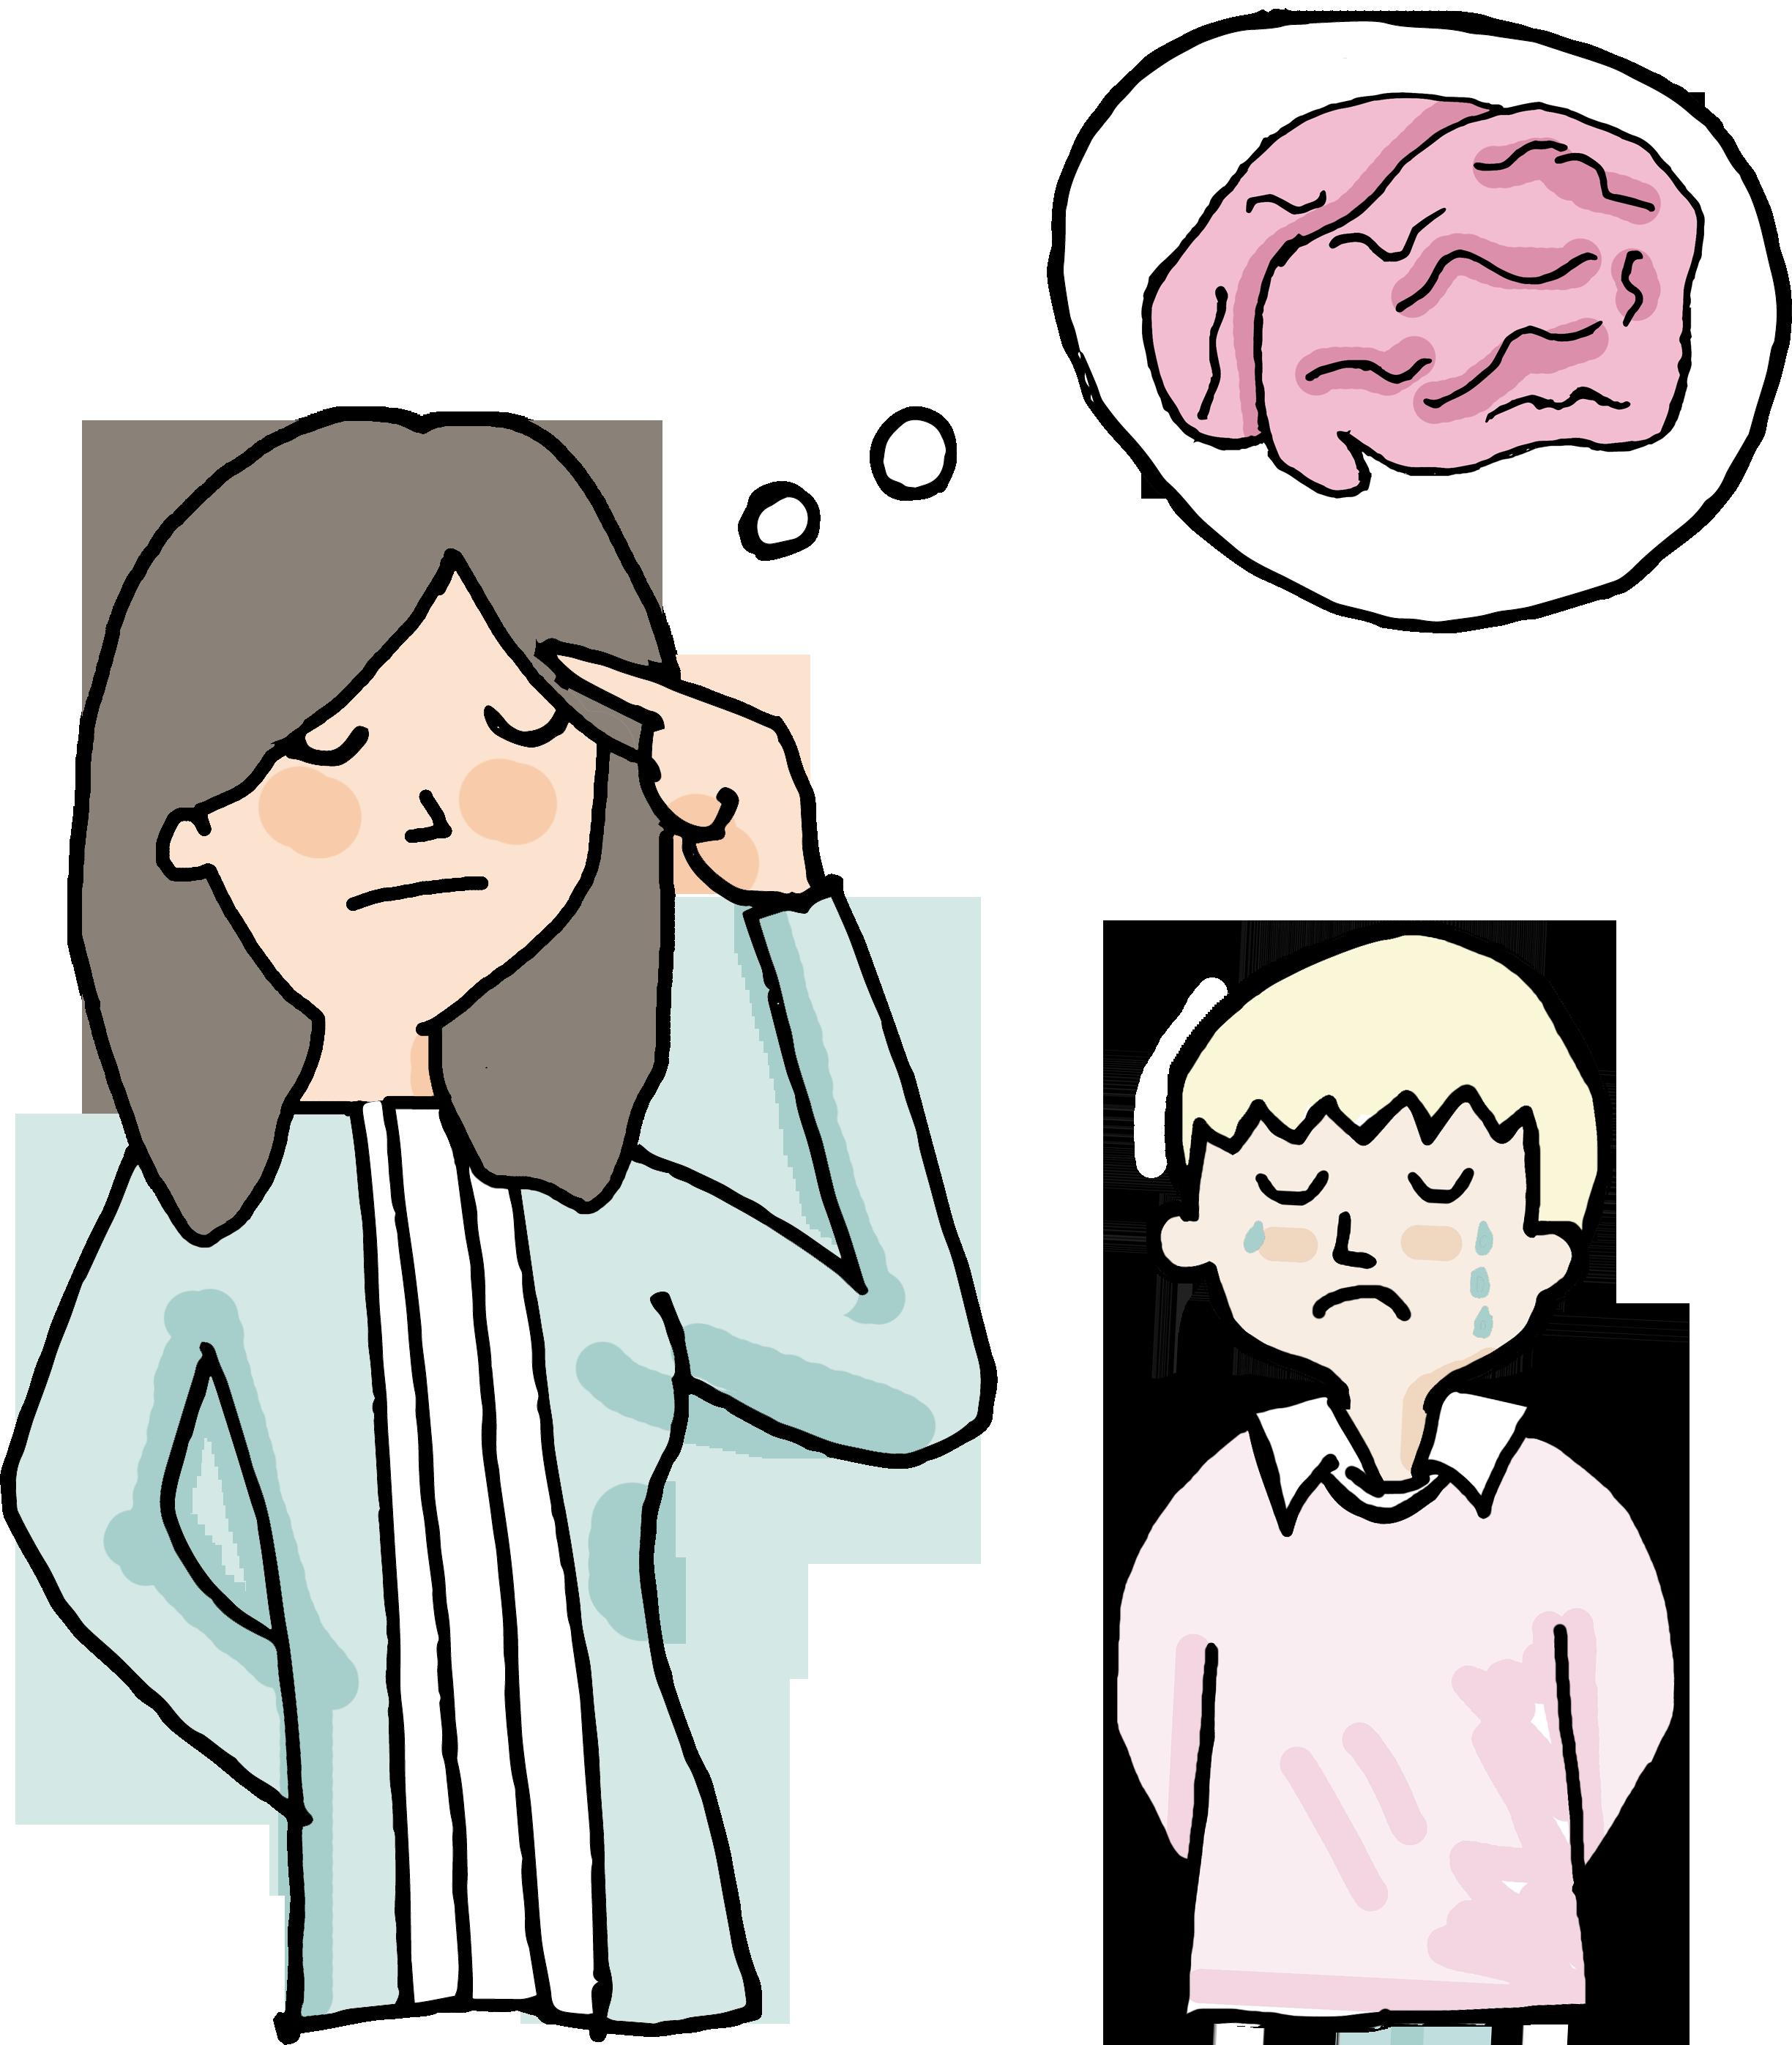 mitos psicologo ayudarte estudio psicologia